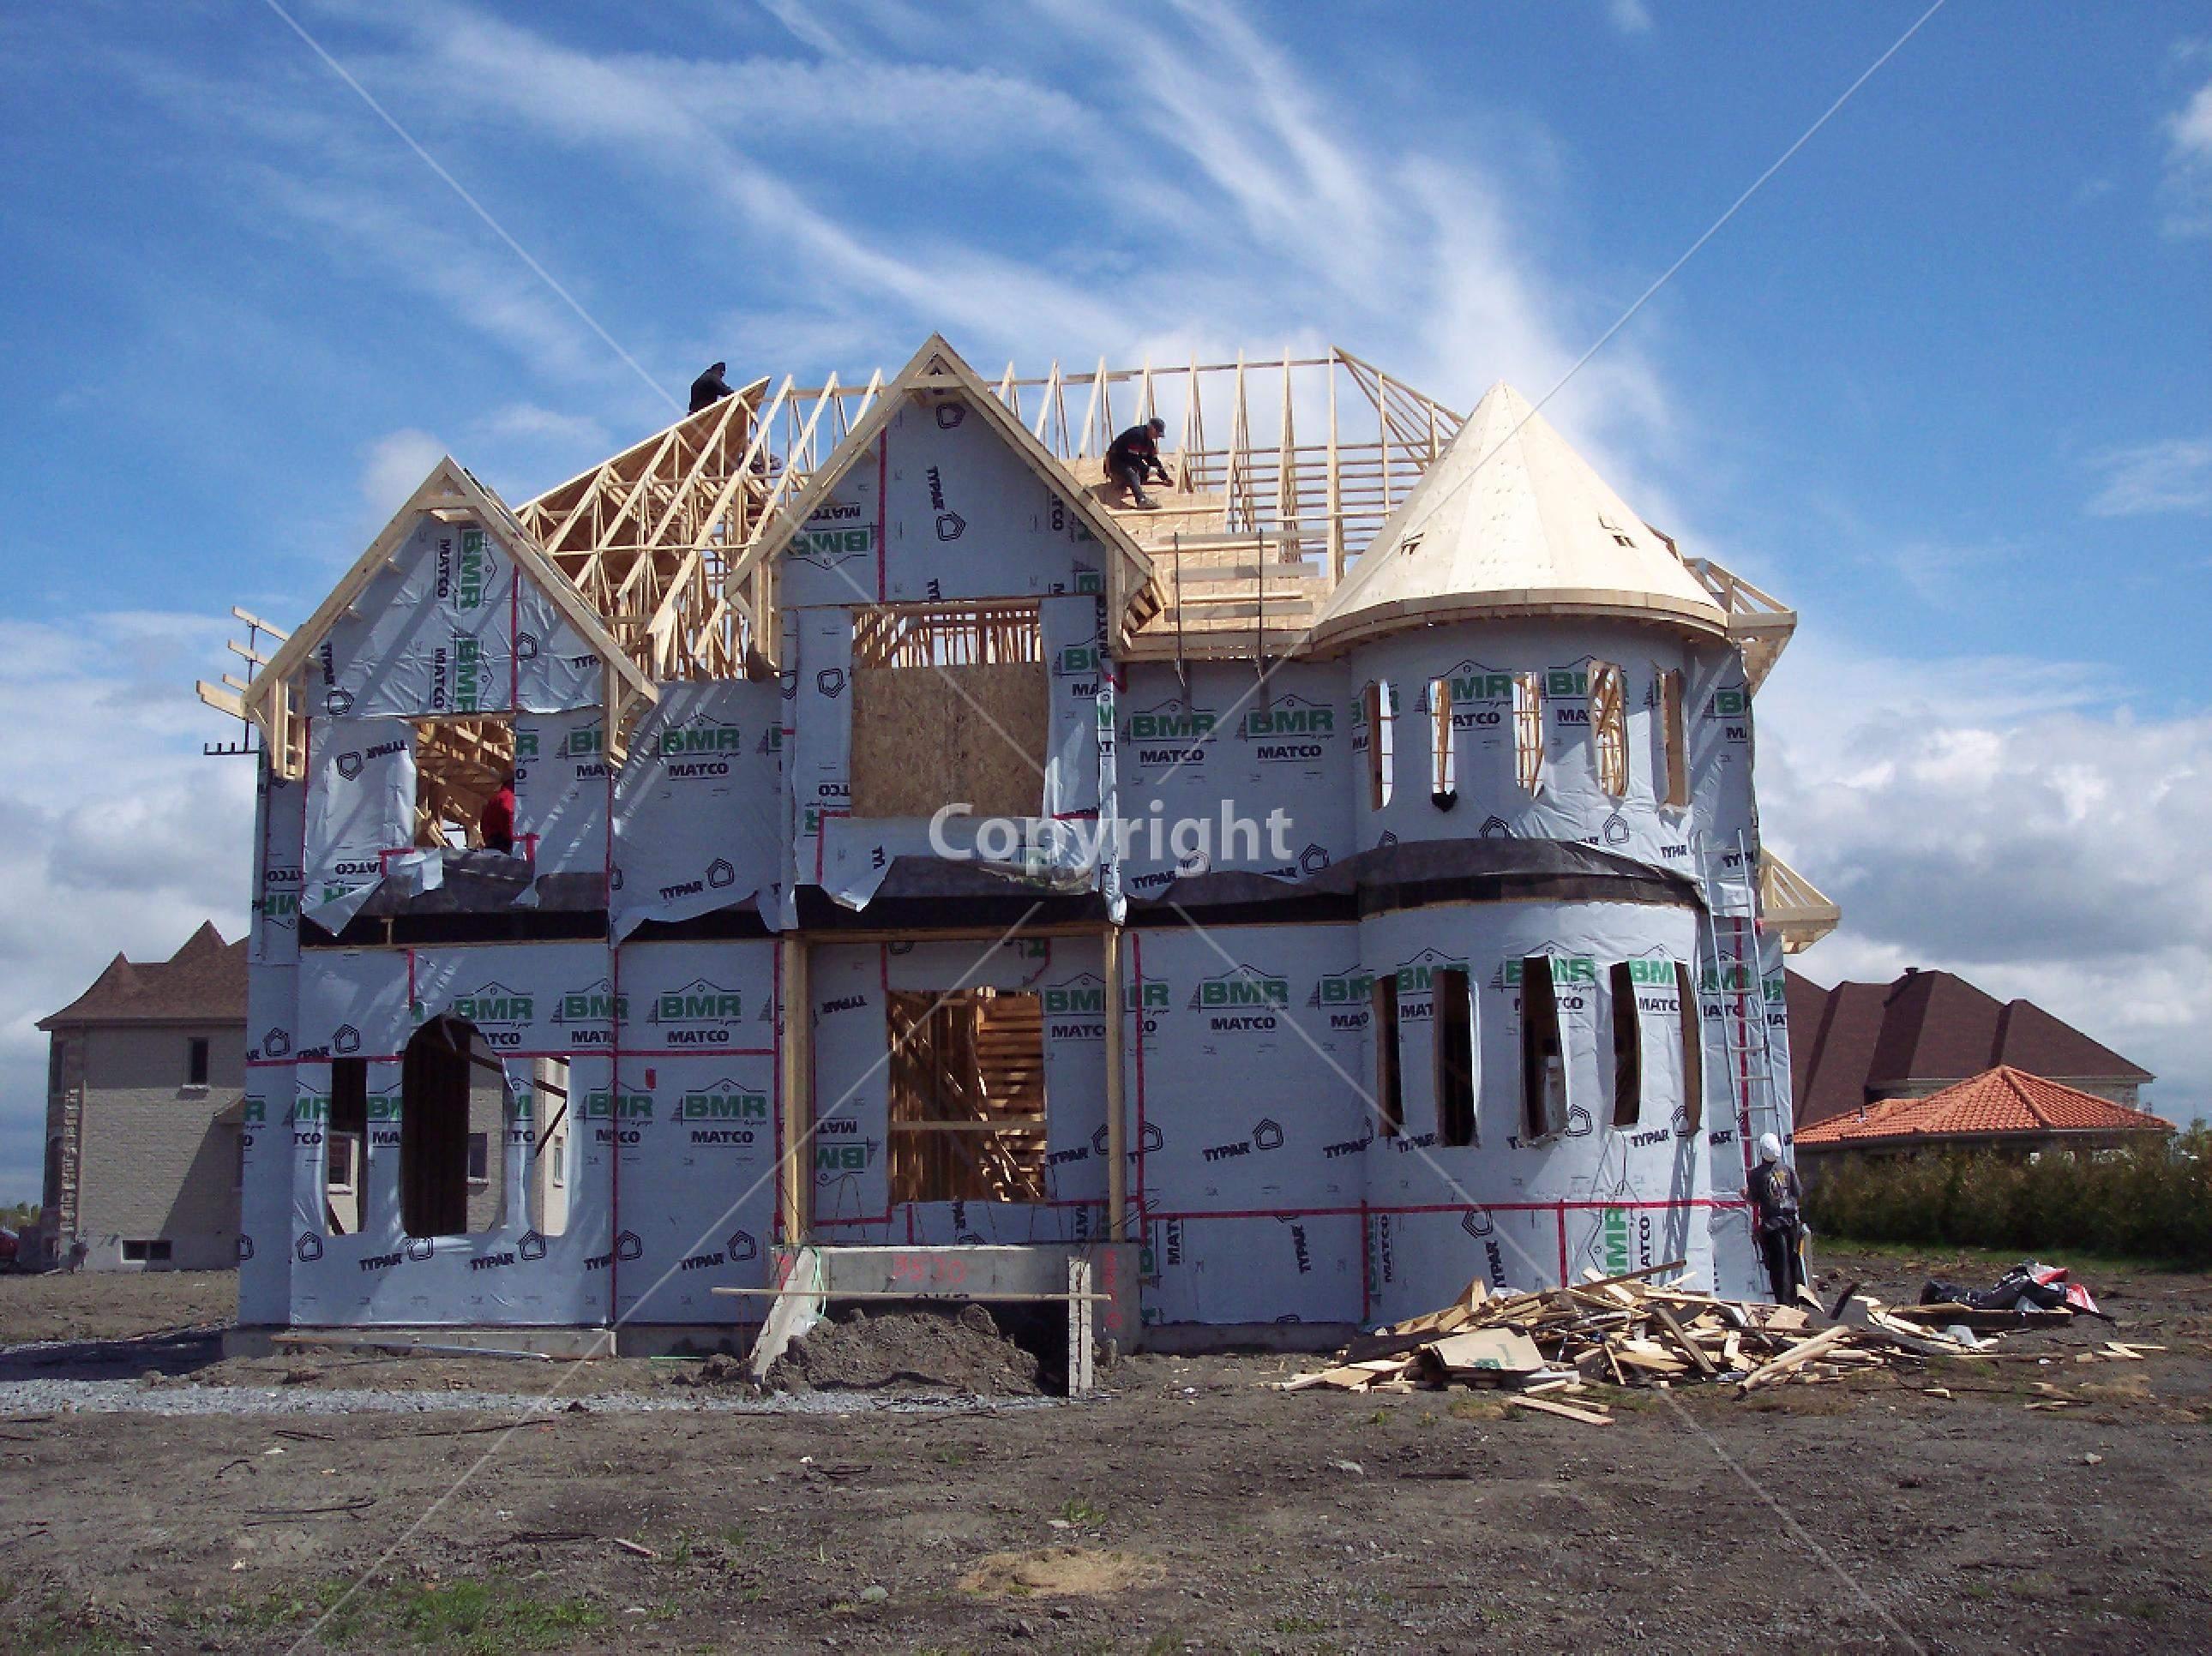 maison-en-construction-qui-necessite-une-demande-de-permis-de-construire